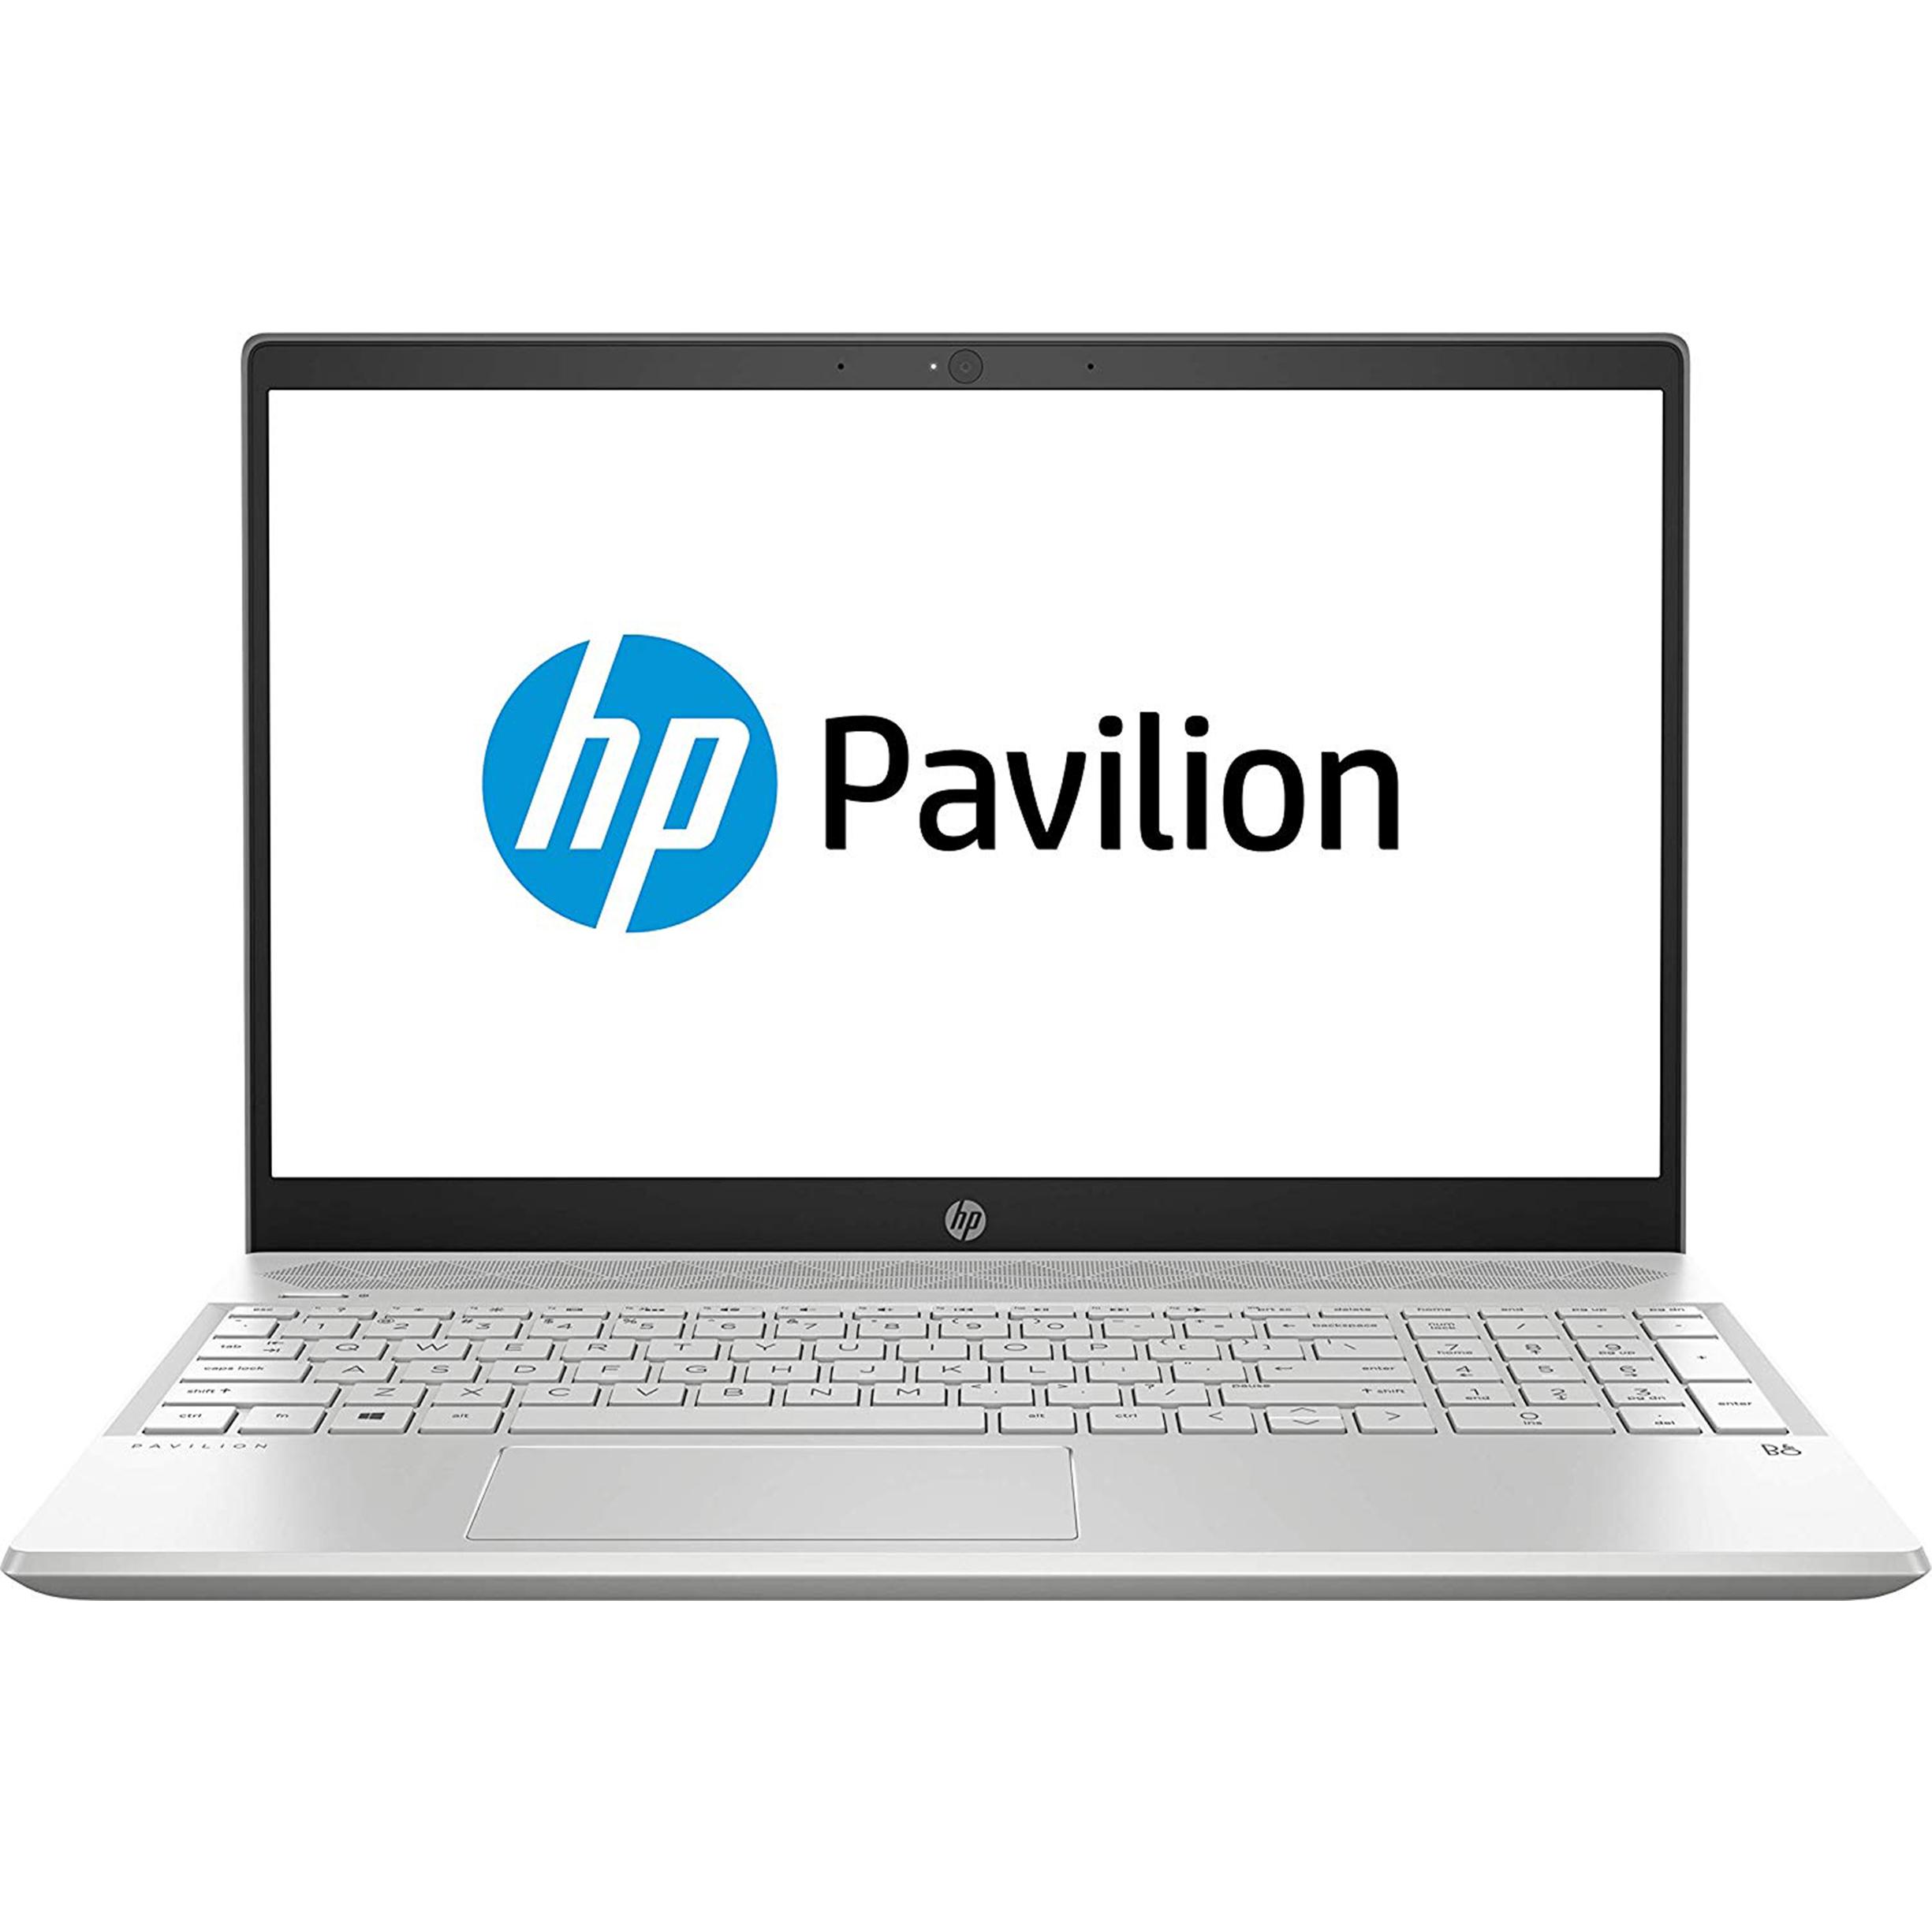 لپ تاپ 15 اینچی اچ پی مدل Pavilion CS1000-D